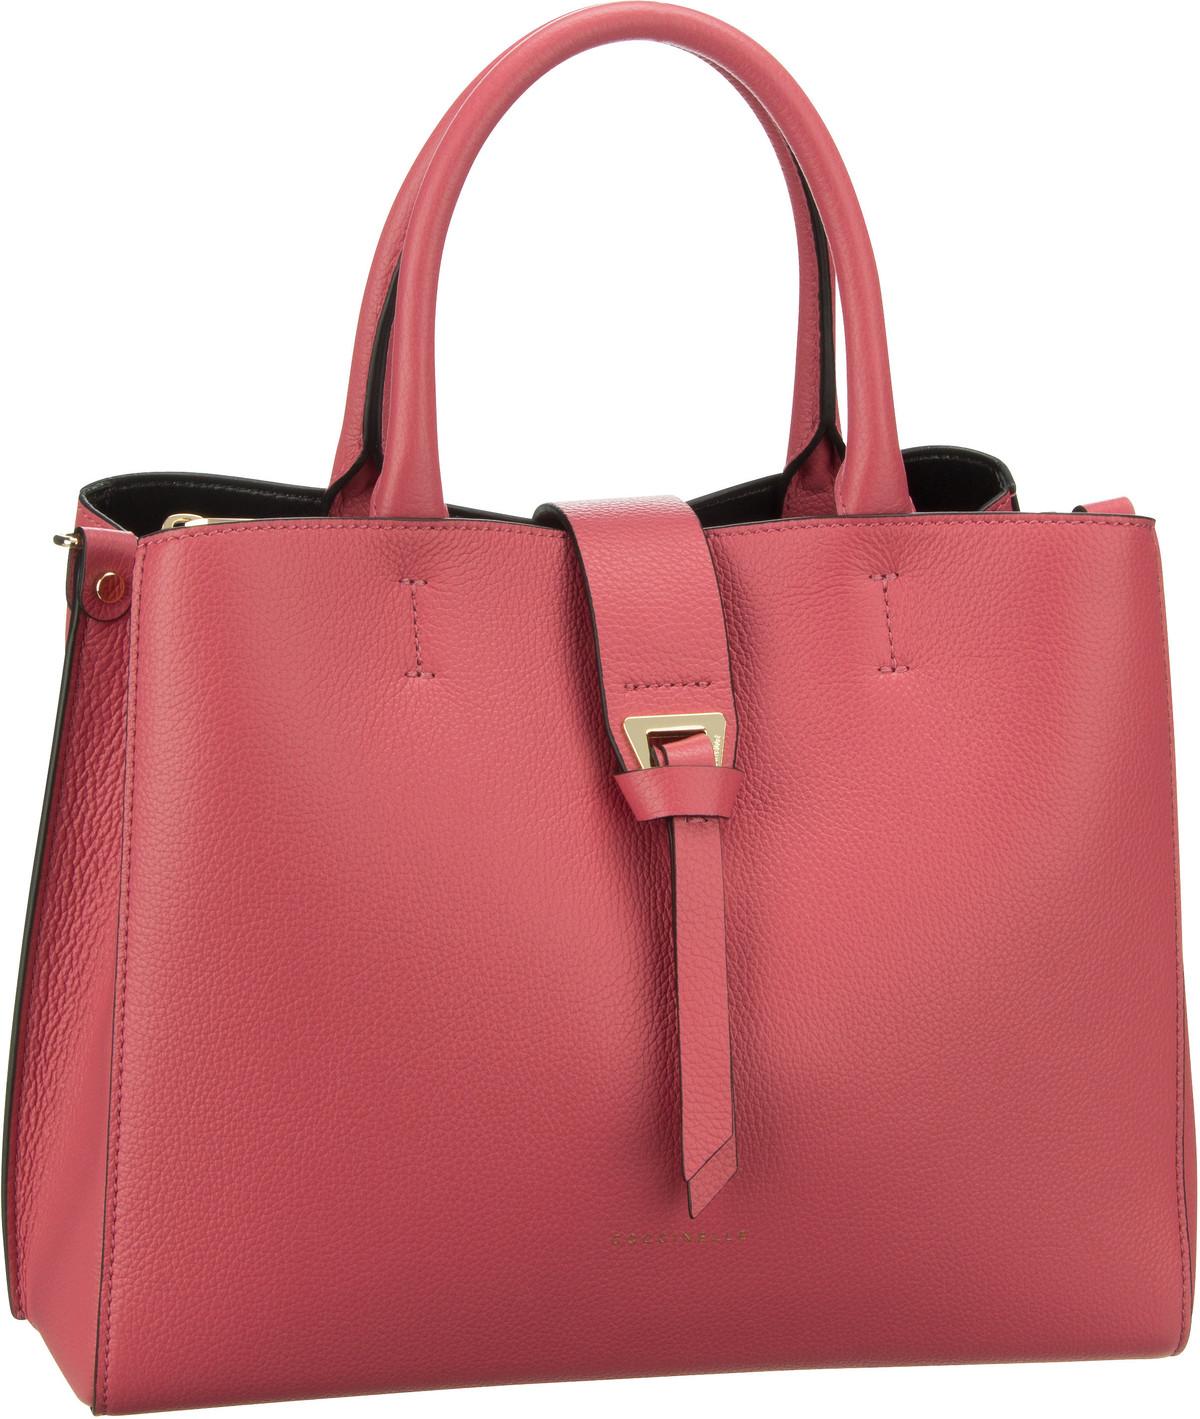 Handtasche Alba 1801 Bouganville